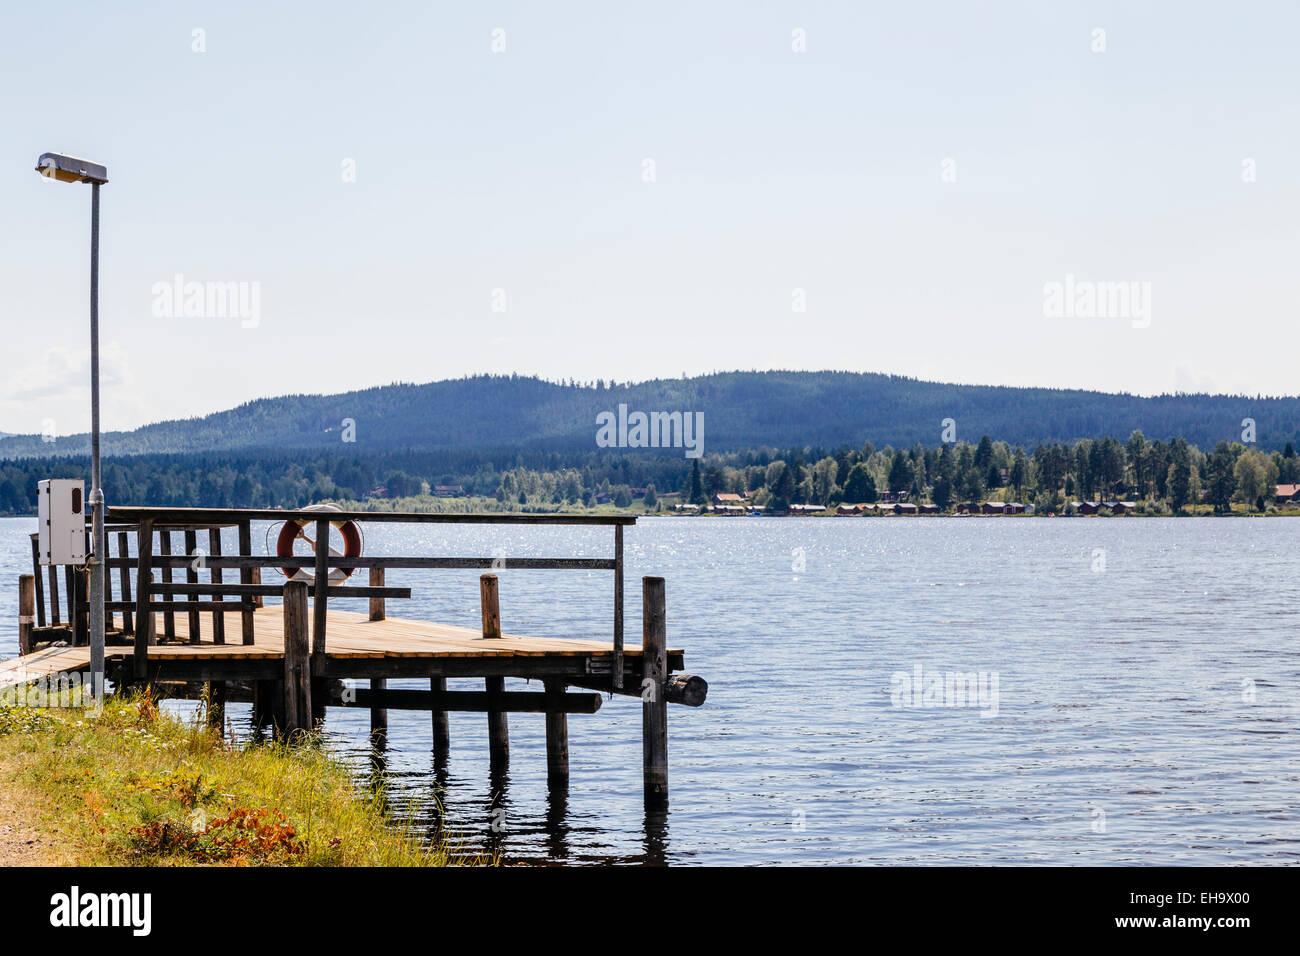 Waterfront, Lake Siljan, Solleron, Mora Municipality, Dalarna County, Sweden Stock Photo